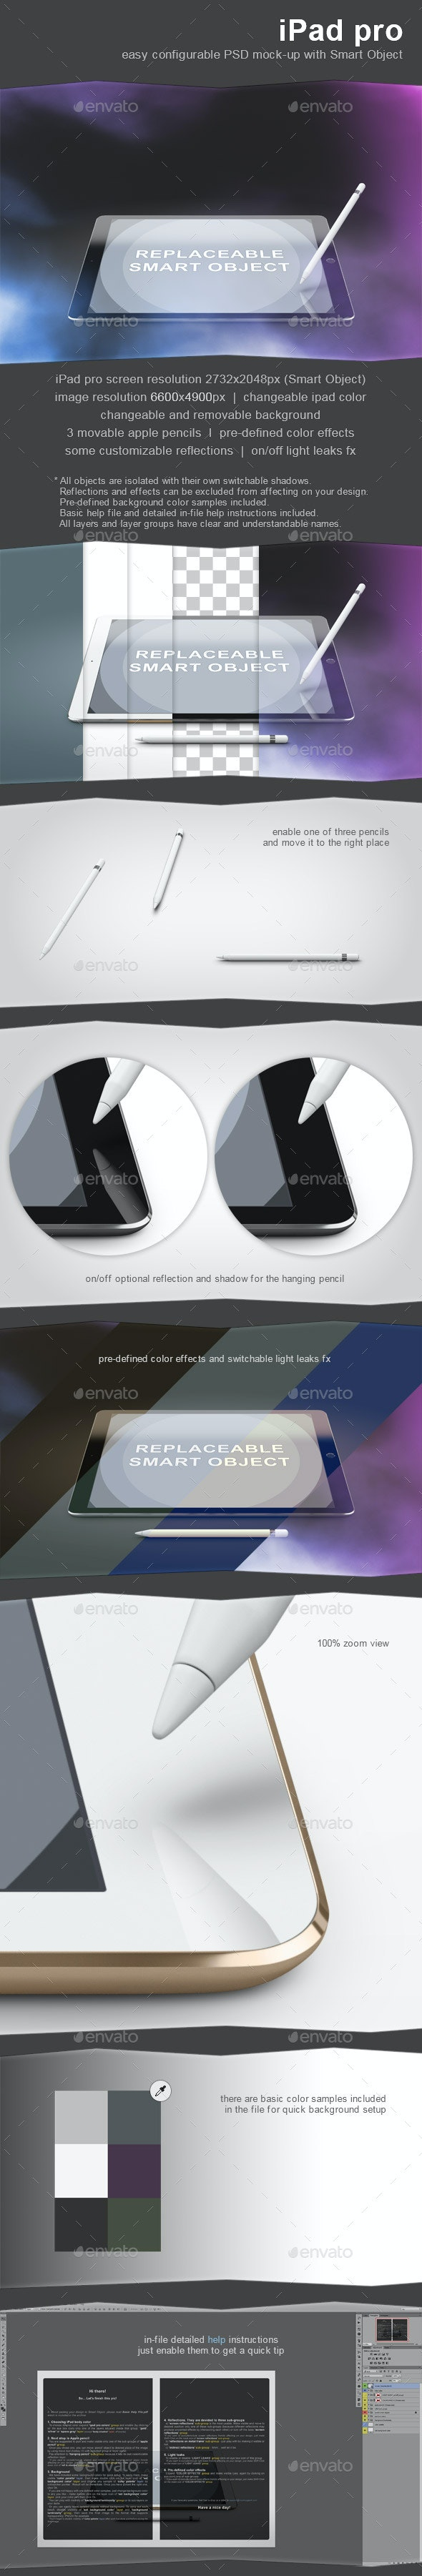 iPad Pro Mock-Up - Mobile Displays